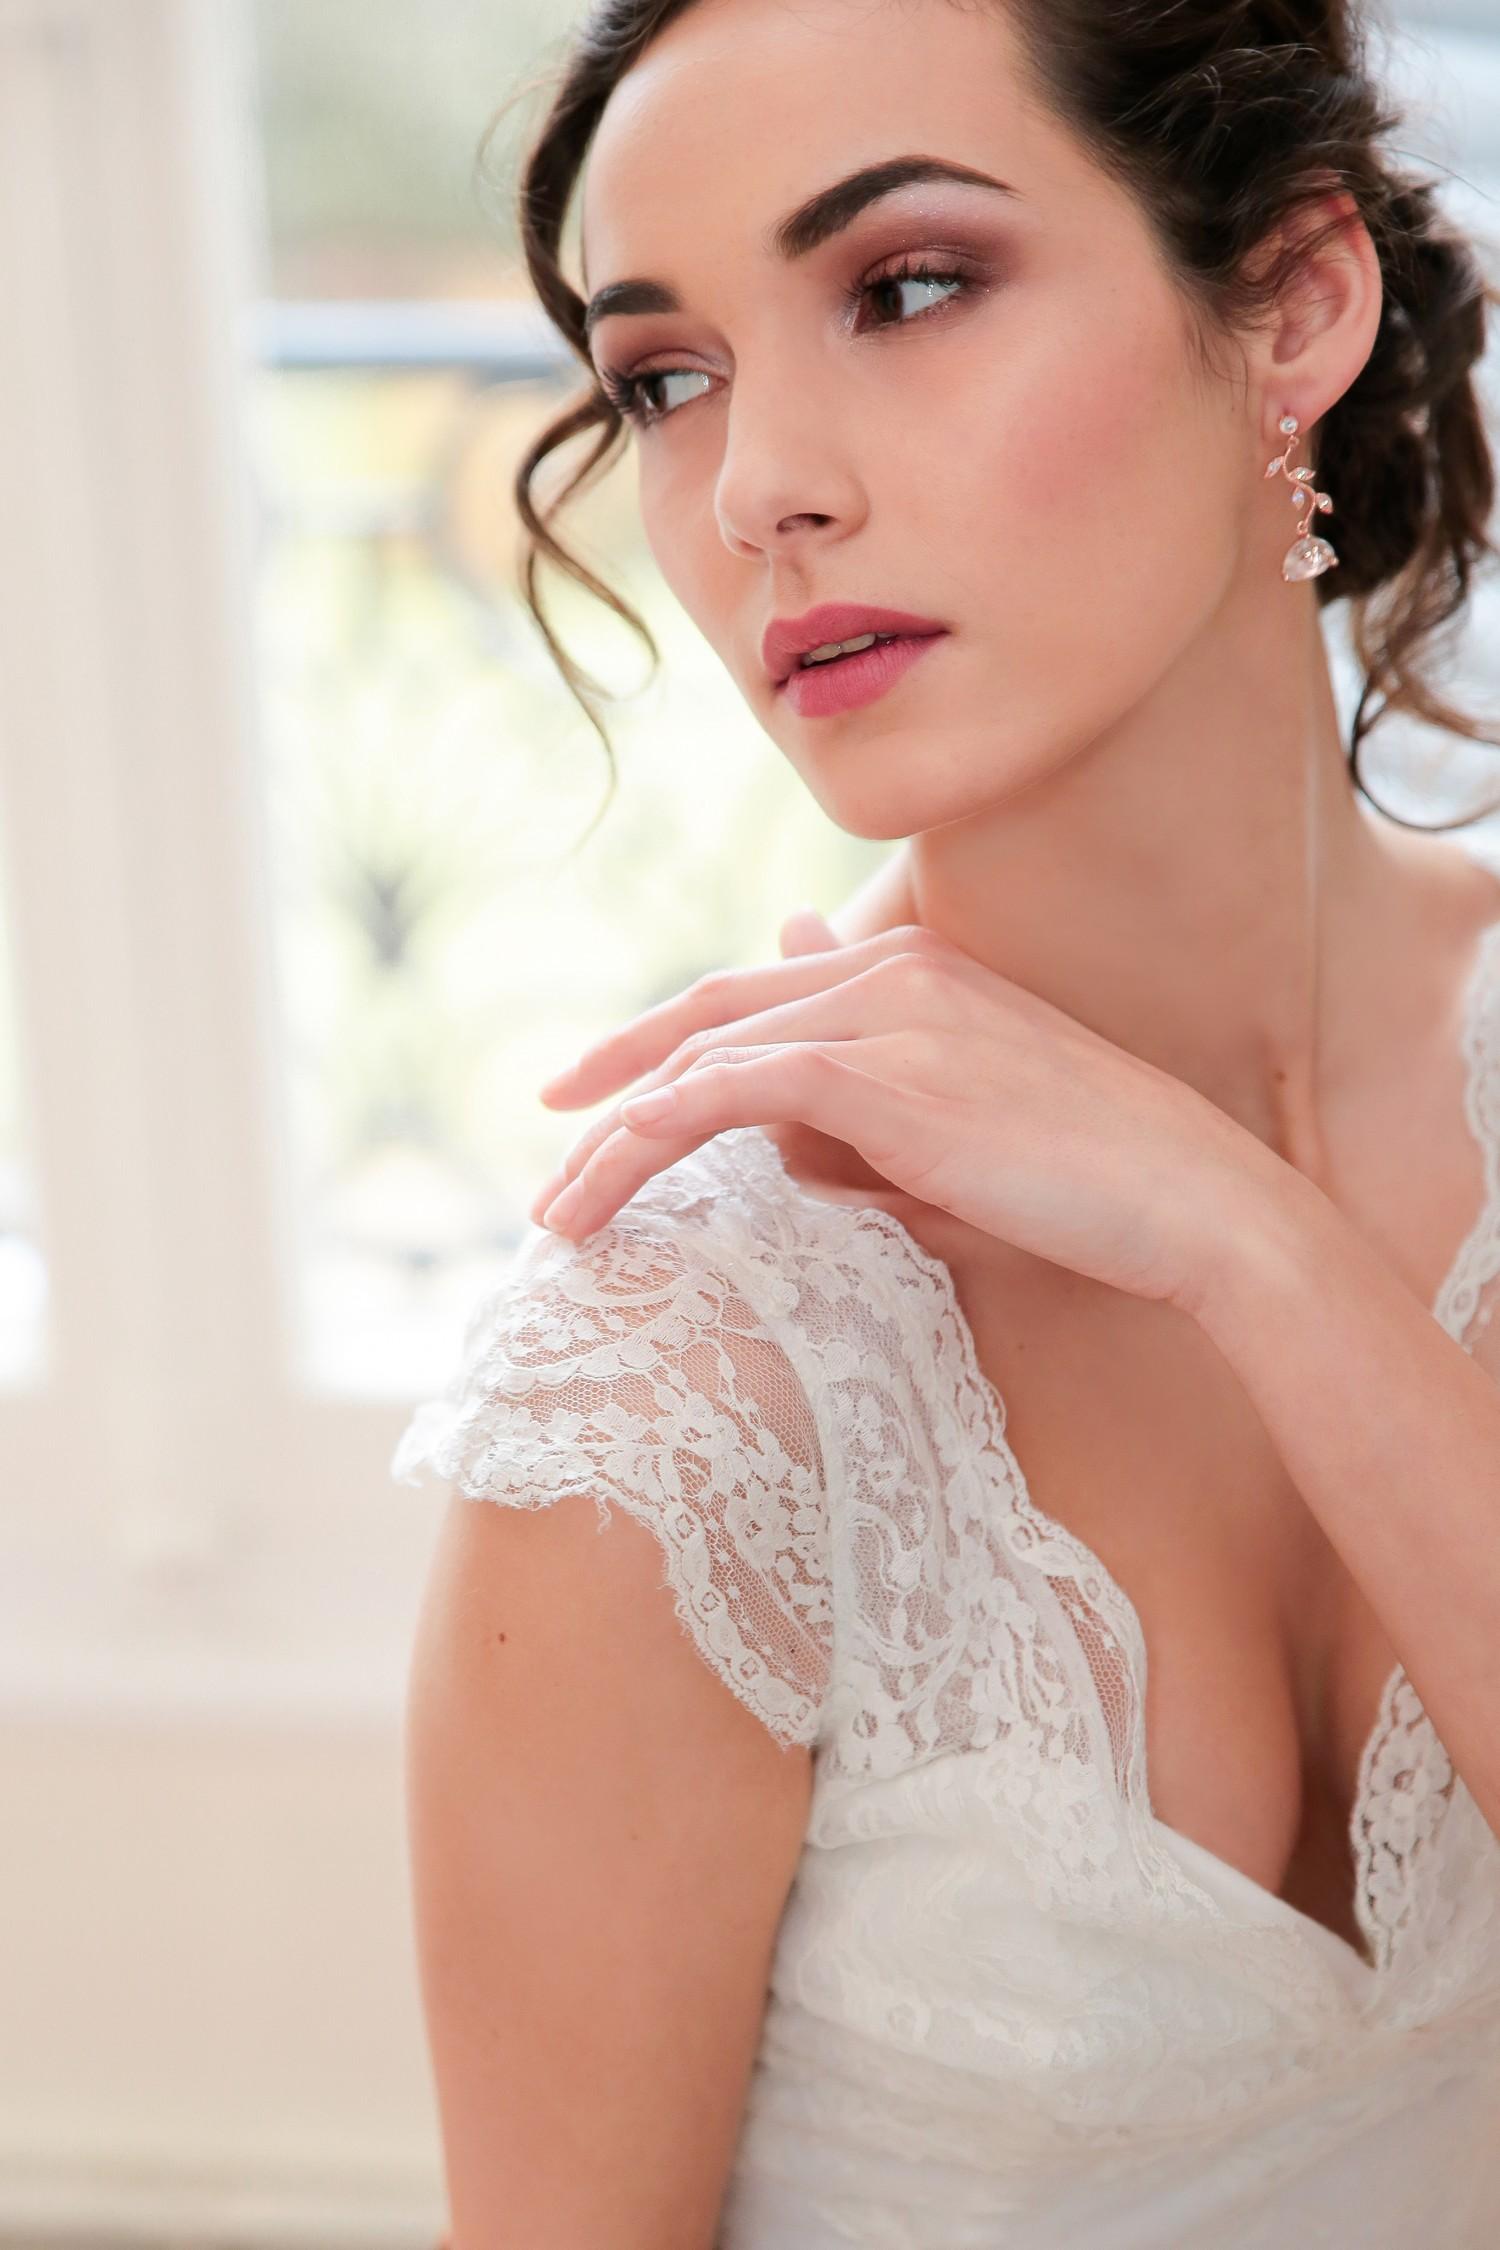 robe pour mariage femme 50 ans la mode des robes de france. Black Bedroom Furniture Sets. Home Design Ideas